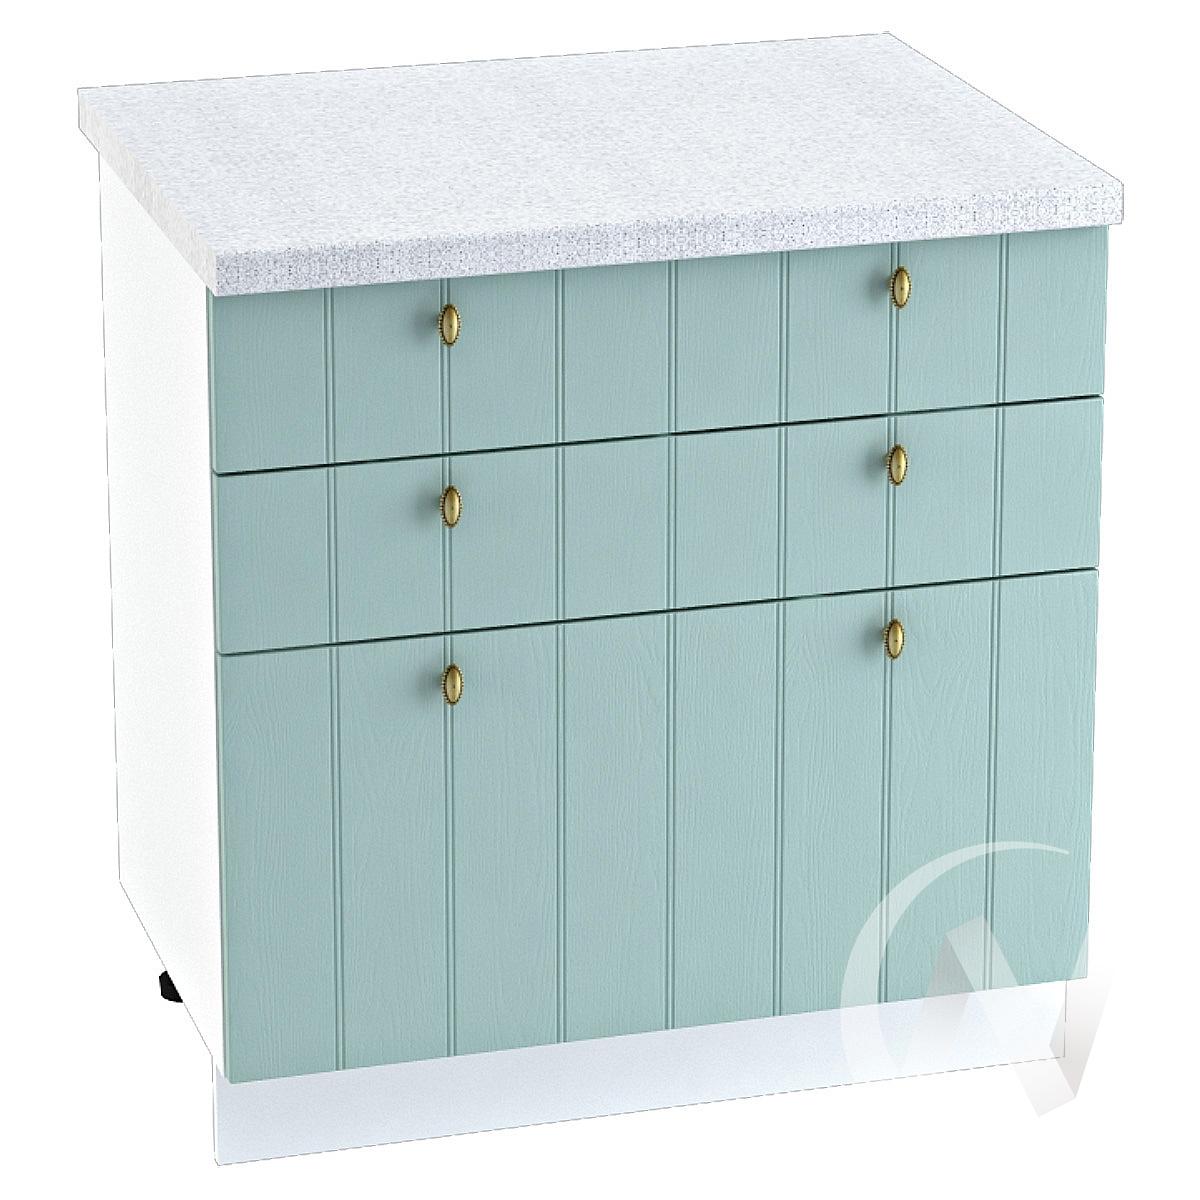 "Кухня ""Прованс"": Шкаф нижний с 3-мя ящиками 800, ШН3Я 800 (голубой/корпус белый)"